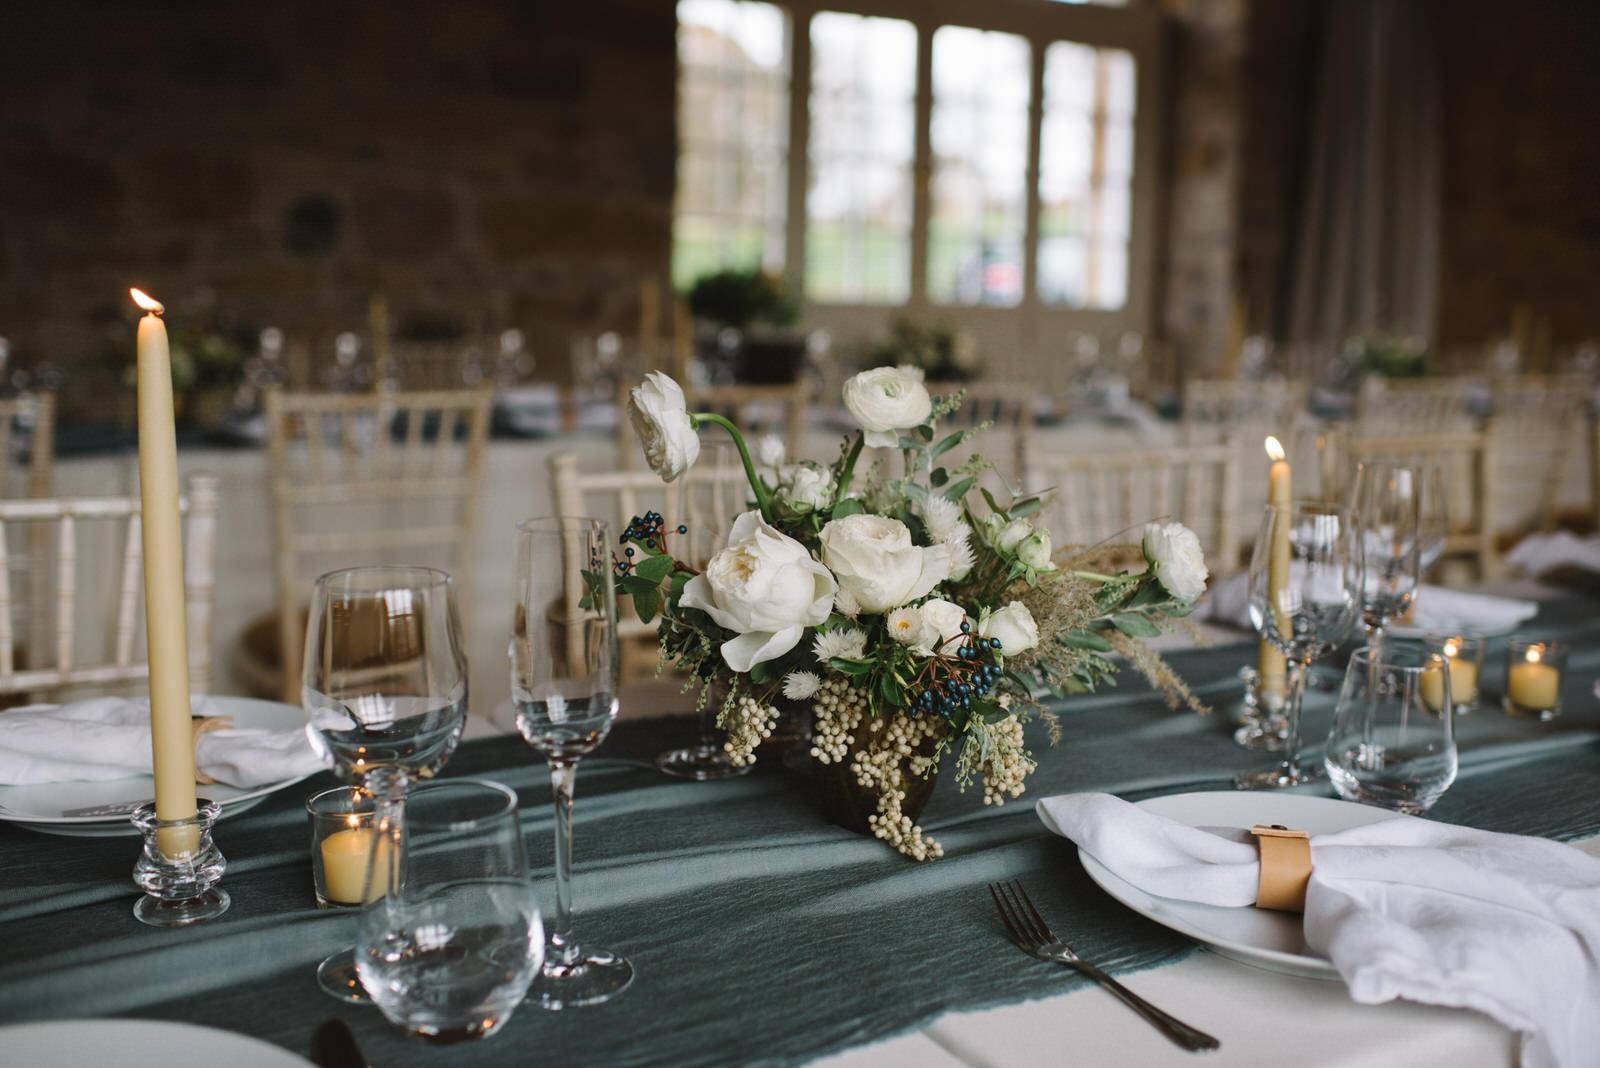 015-COLSTOUN-HOUSE-WEDDING-ALTERNATIVE-WEDDING-PHOTOGRAPHER-GLASGOW-WEDDING-PHOTOGRAPHER-STYLISH-SCOTTISH-WEDDING.JPG